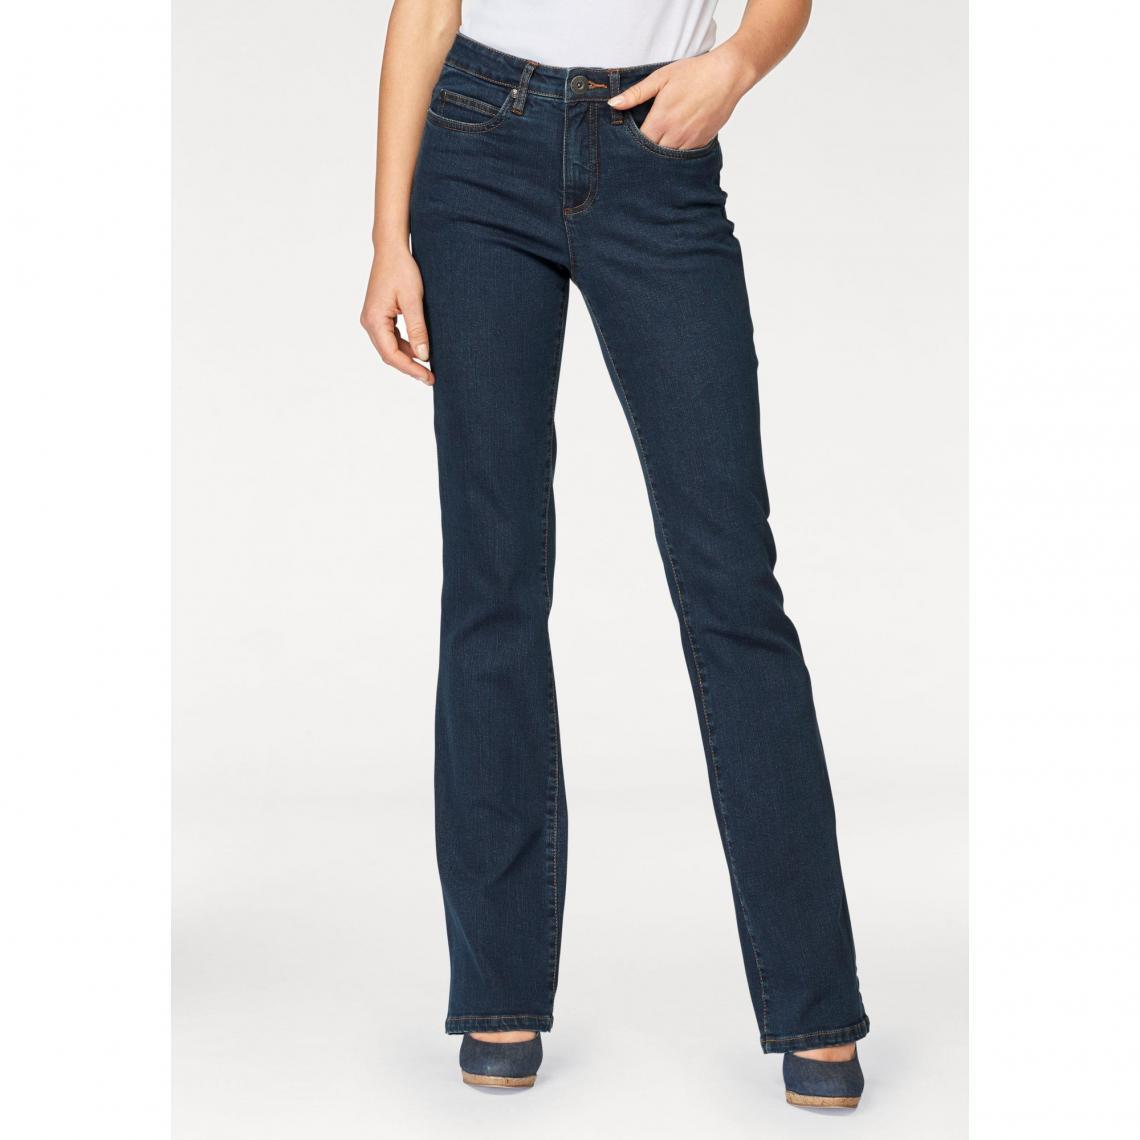 b1a2c74bd475 Jean bootcut taille haute extra confort femme Arizona - bleu foncé Arizona  Femme